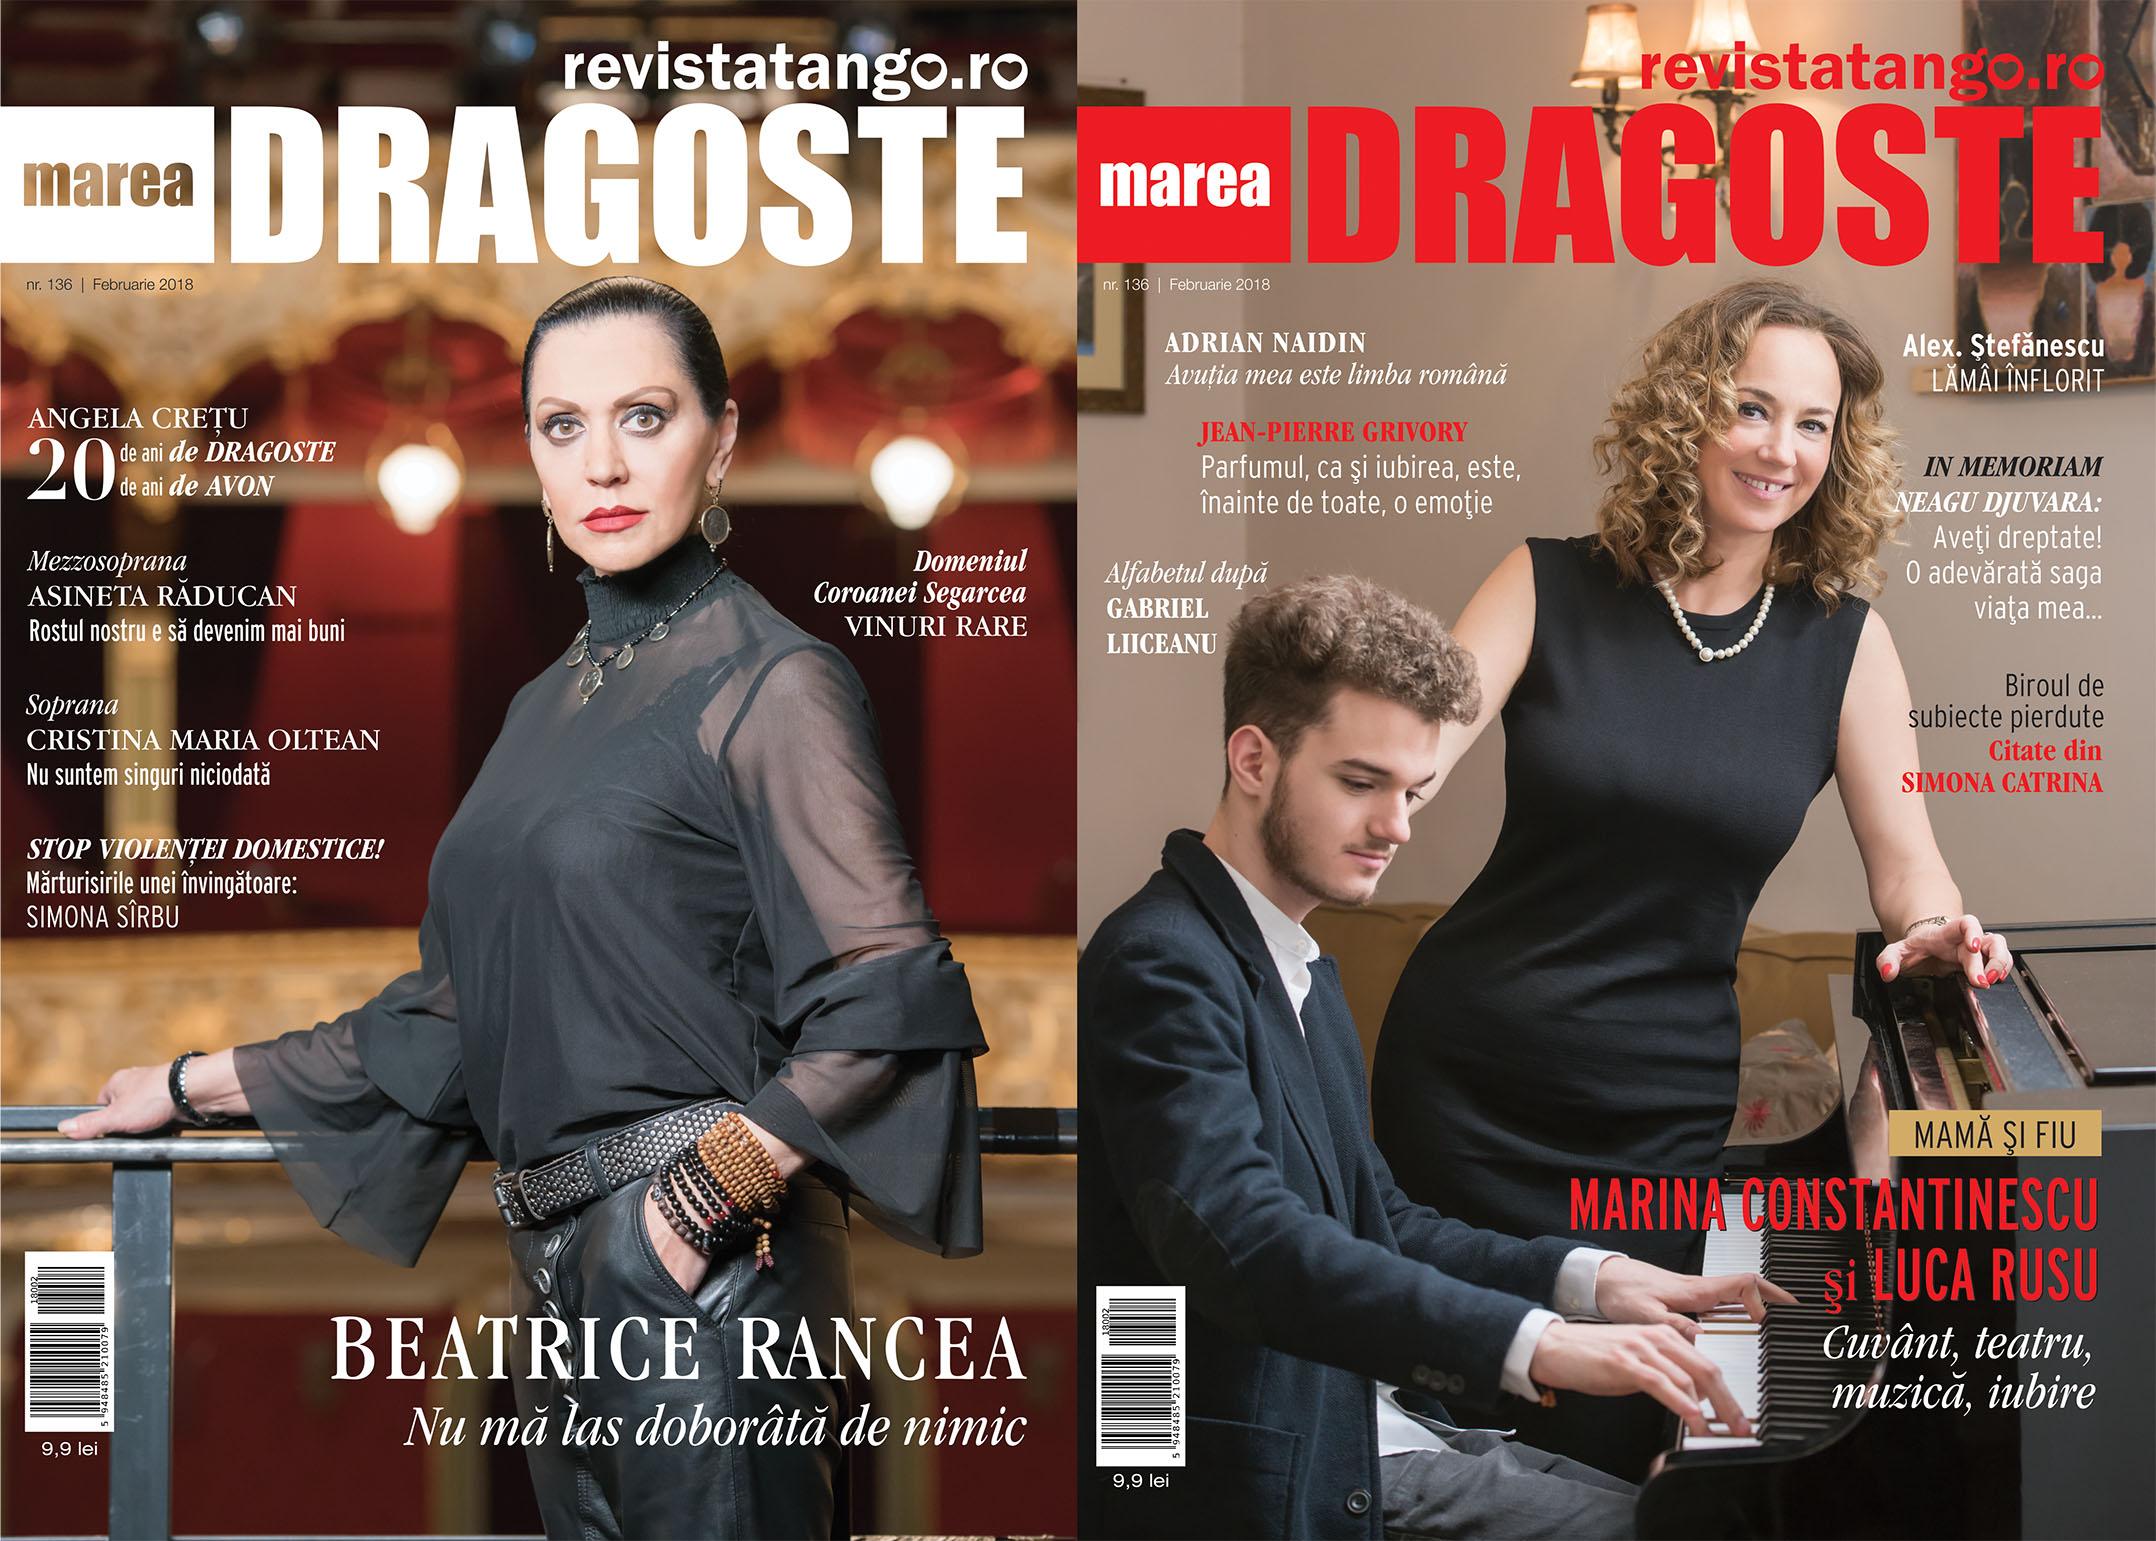 Beatrice Rancea, Marina Constantinescu si Luca Rusu pe copertele Marea Dragoste-revistatango.ro, nr. 136, februarie 2018